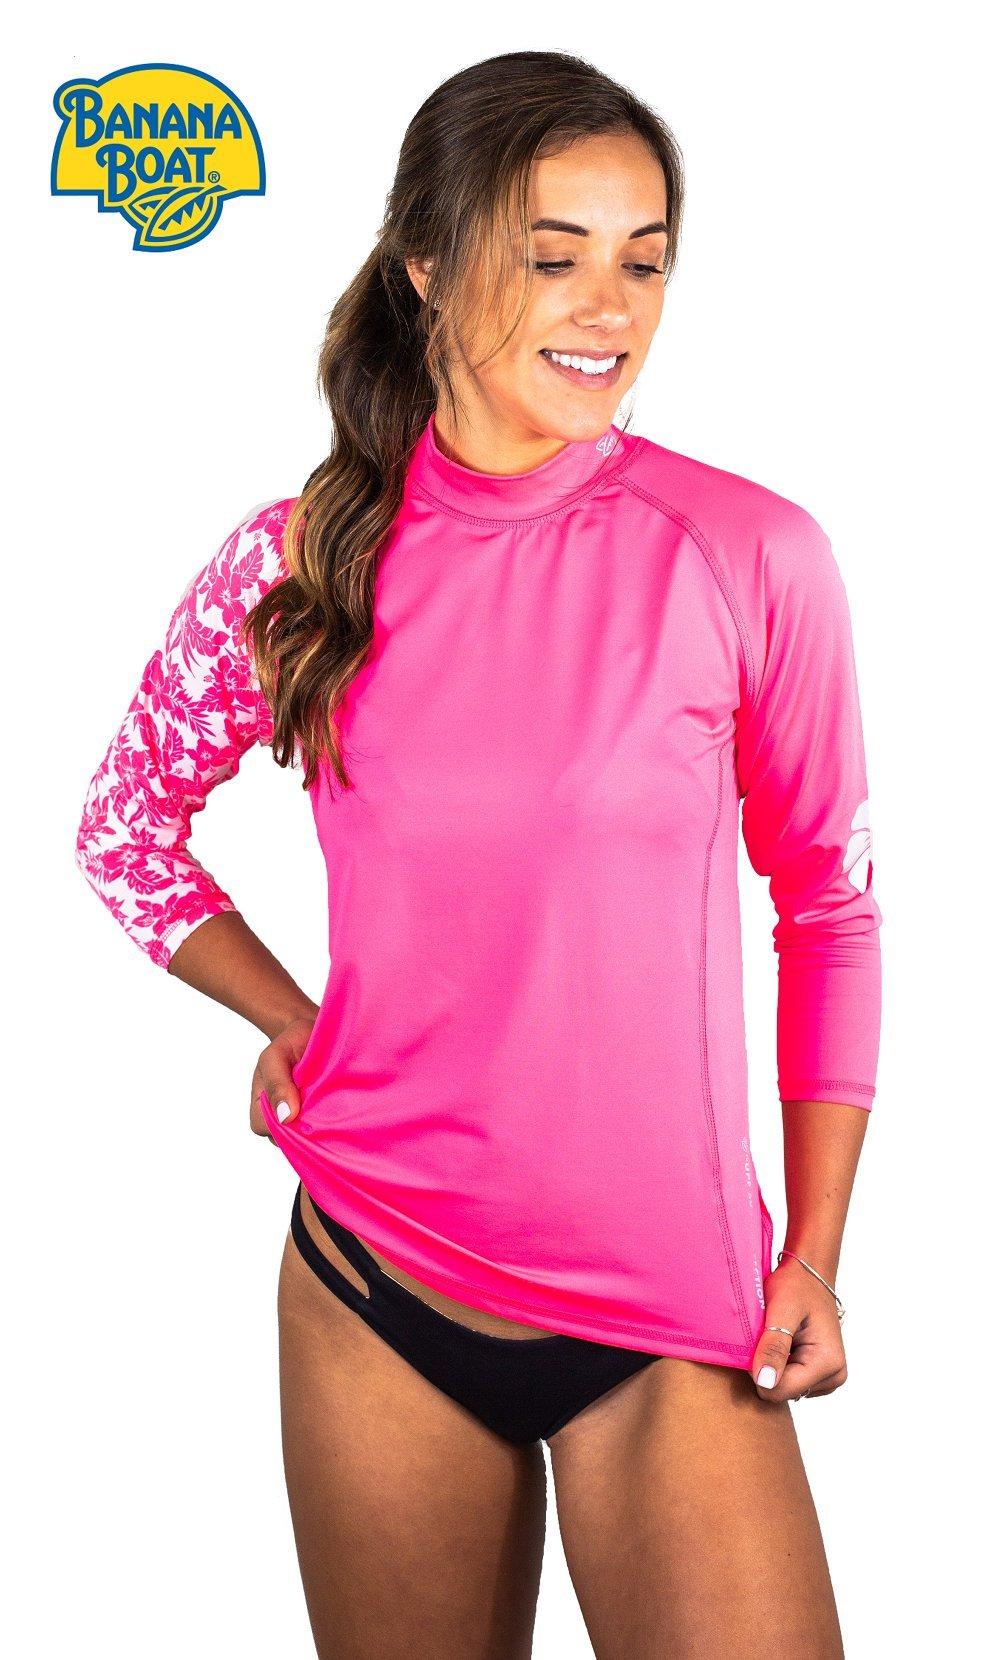 Banana Boat Women's Long Sleeve Rashguard UPF50+ Sun Protective Swim Shirt Hibiscus Islander Top Neon Pink Large